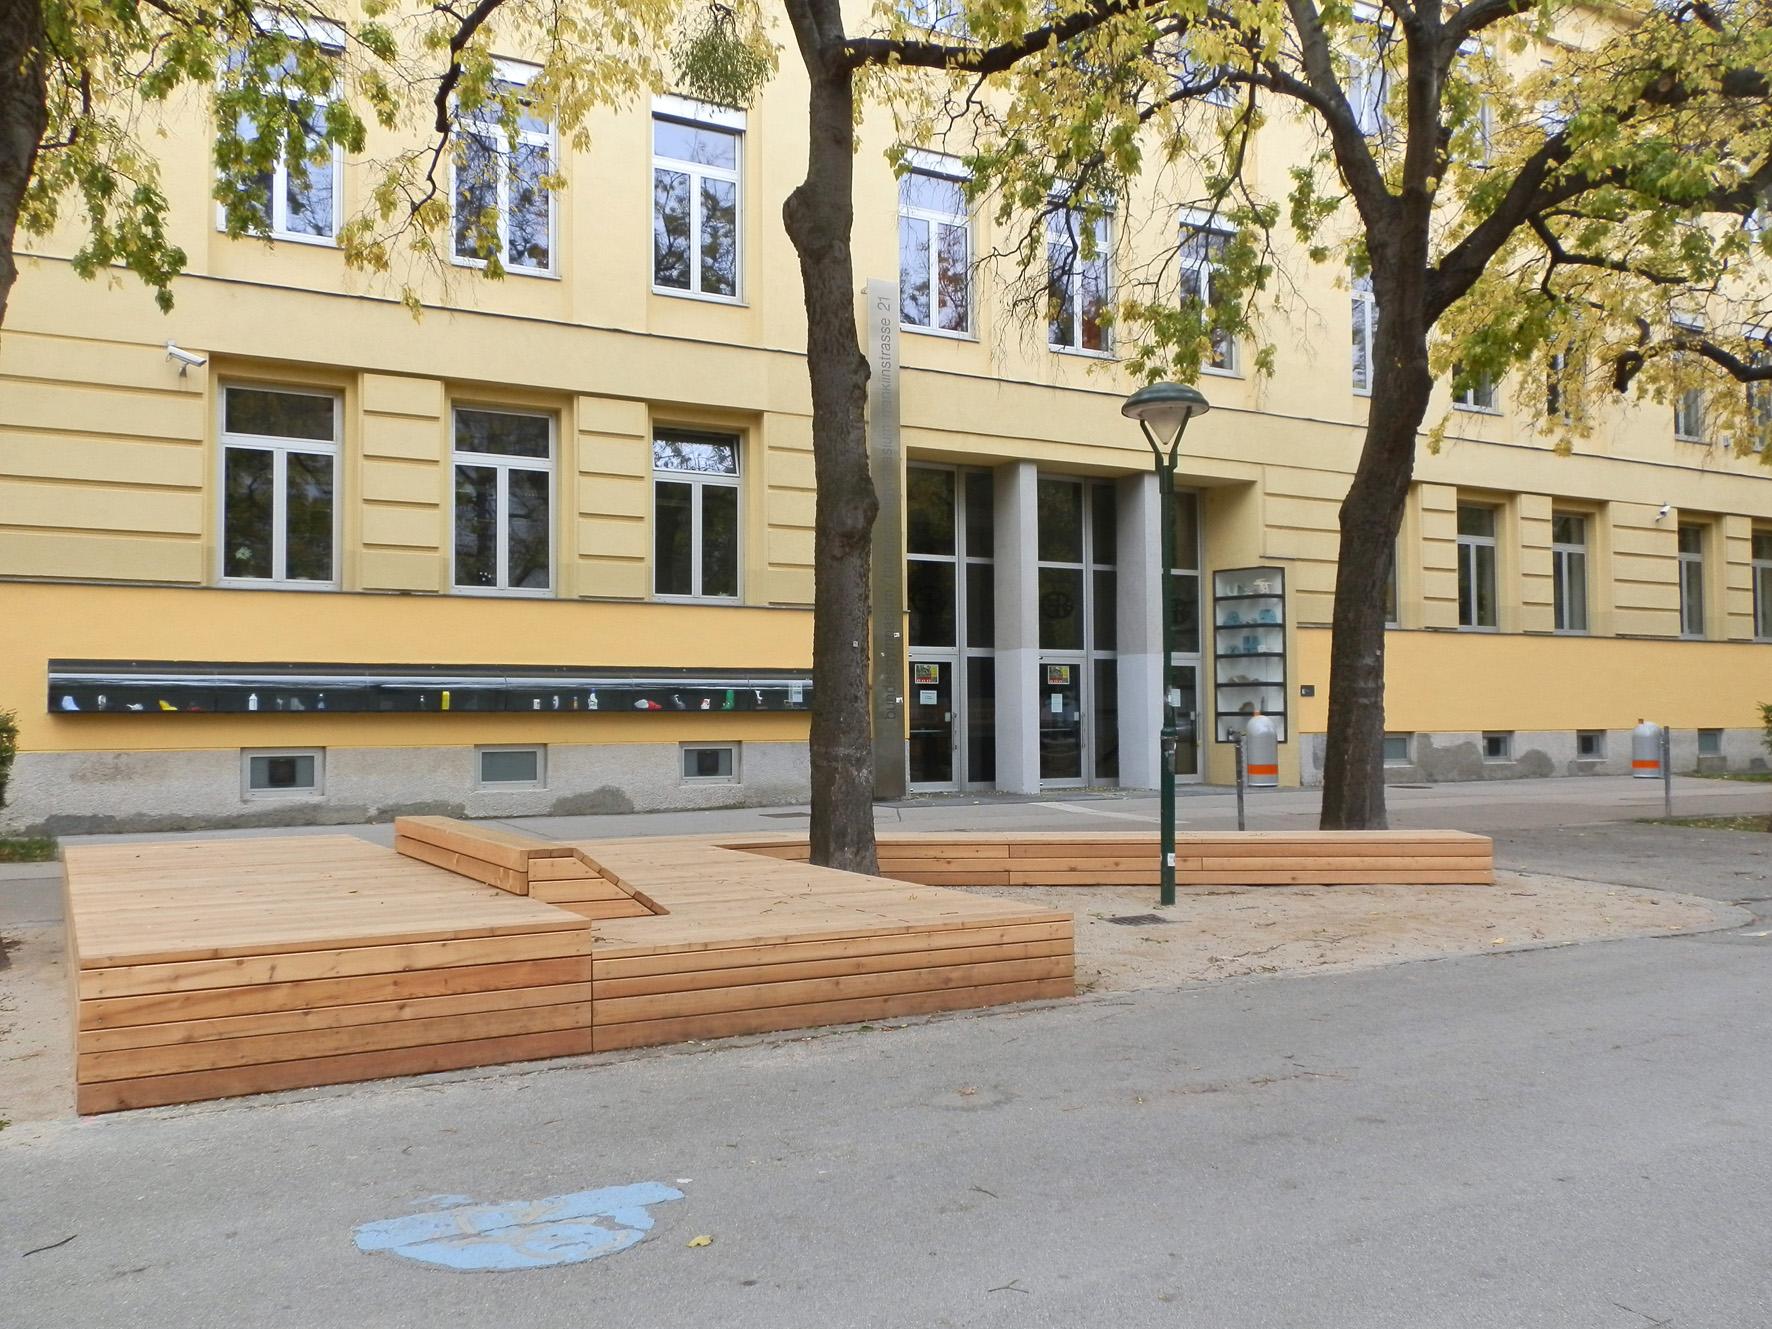 Projekt Franklinstraße, Foto (C) Irmgard Brottrager